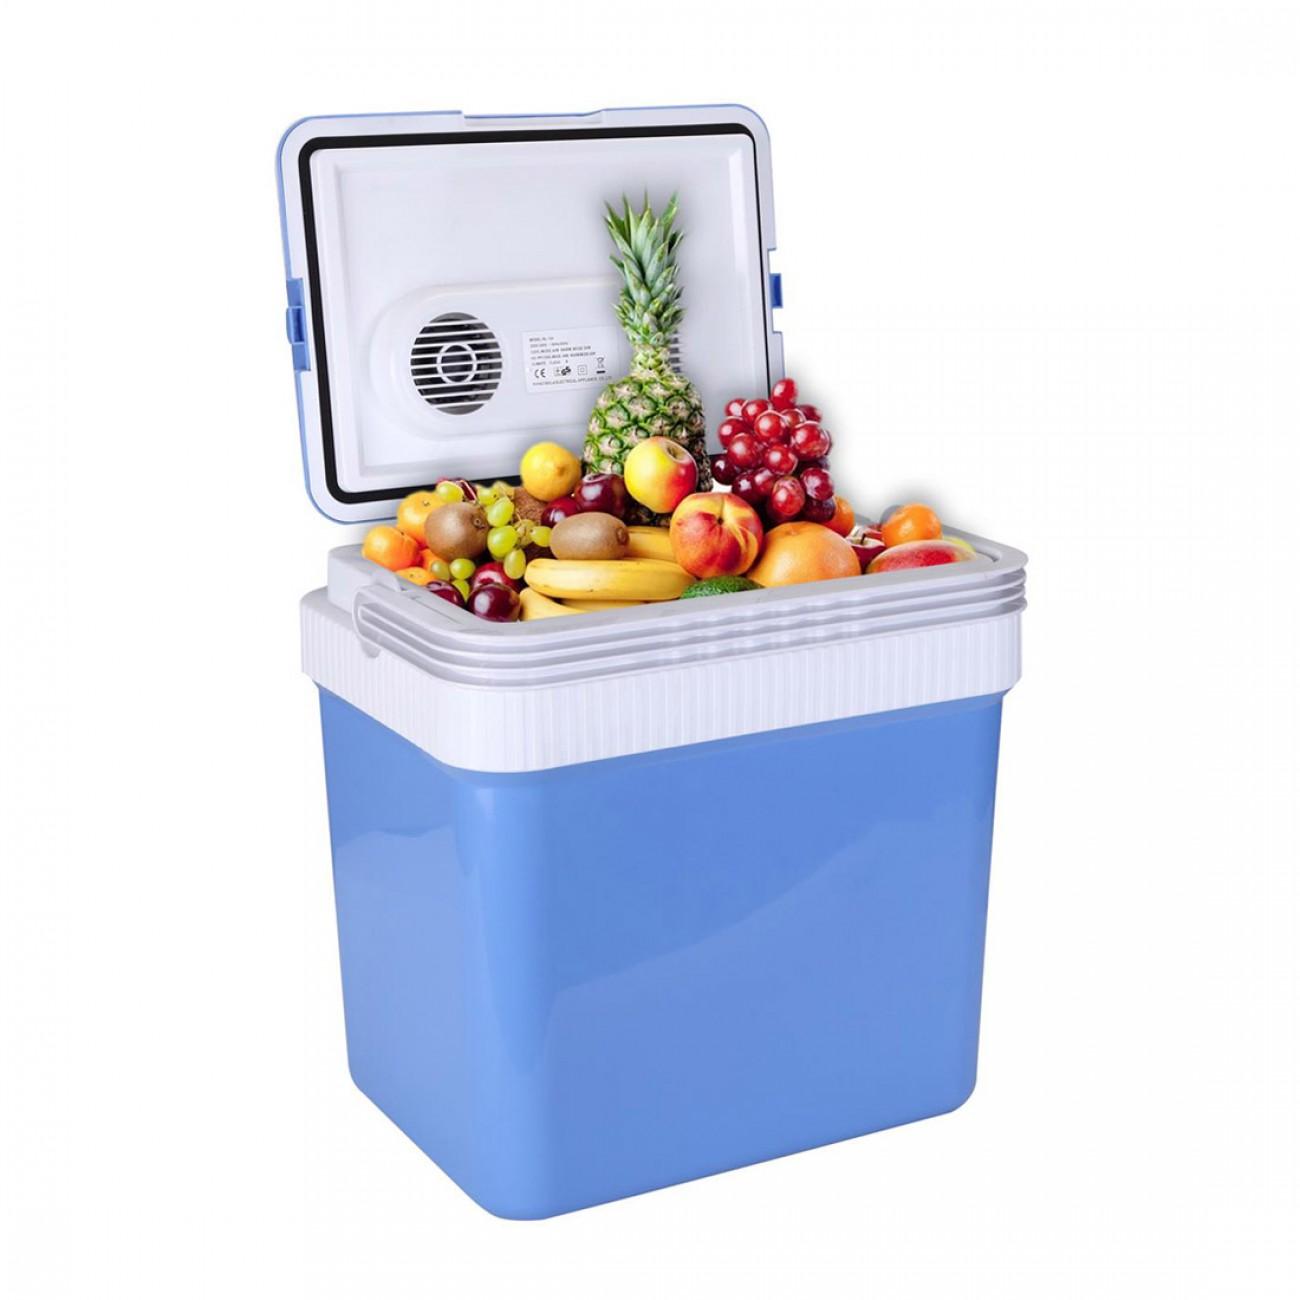 Хладилна чанта ZEPHYR ZP 1448 A24, 24 литра, 12V DC, Охлаждане и затопляне, Двойно захранване, Син в Хладилни чанти - ZEPHYR | Alleop